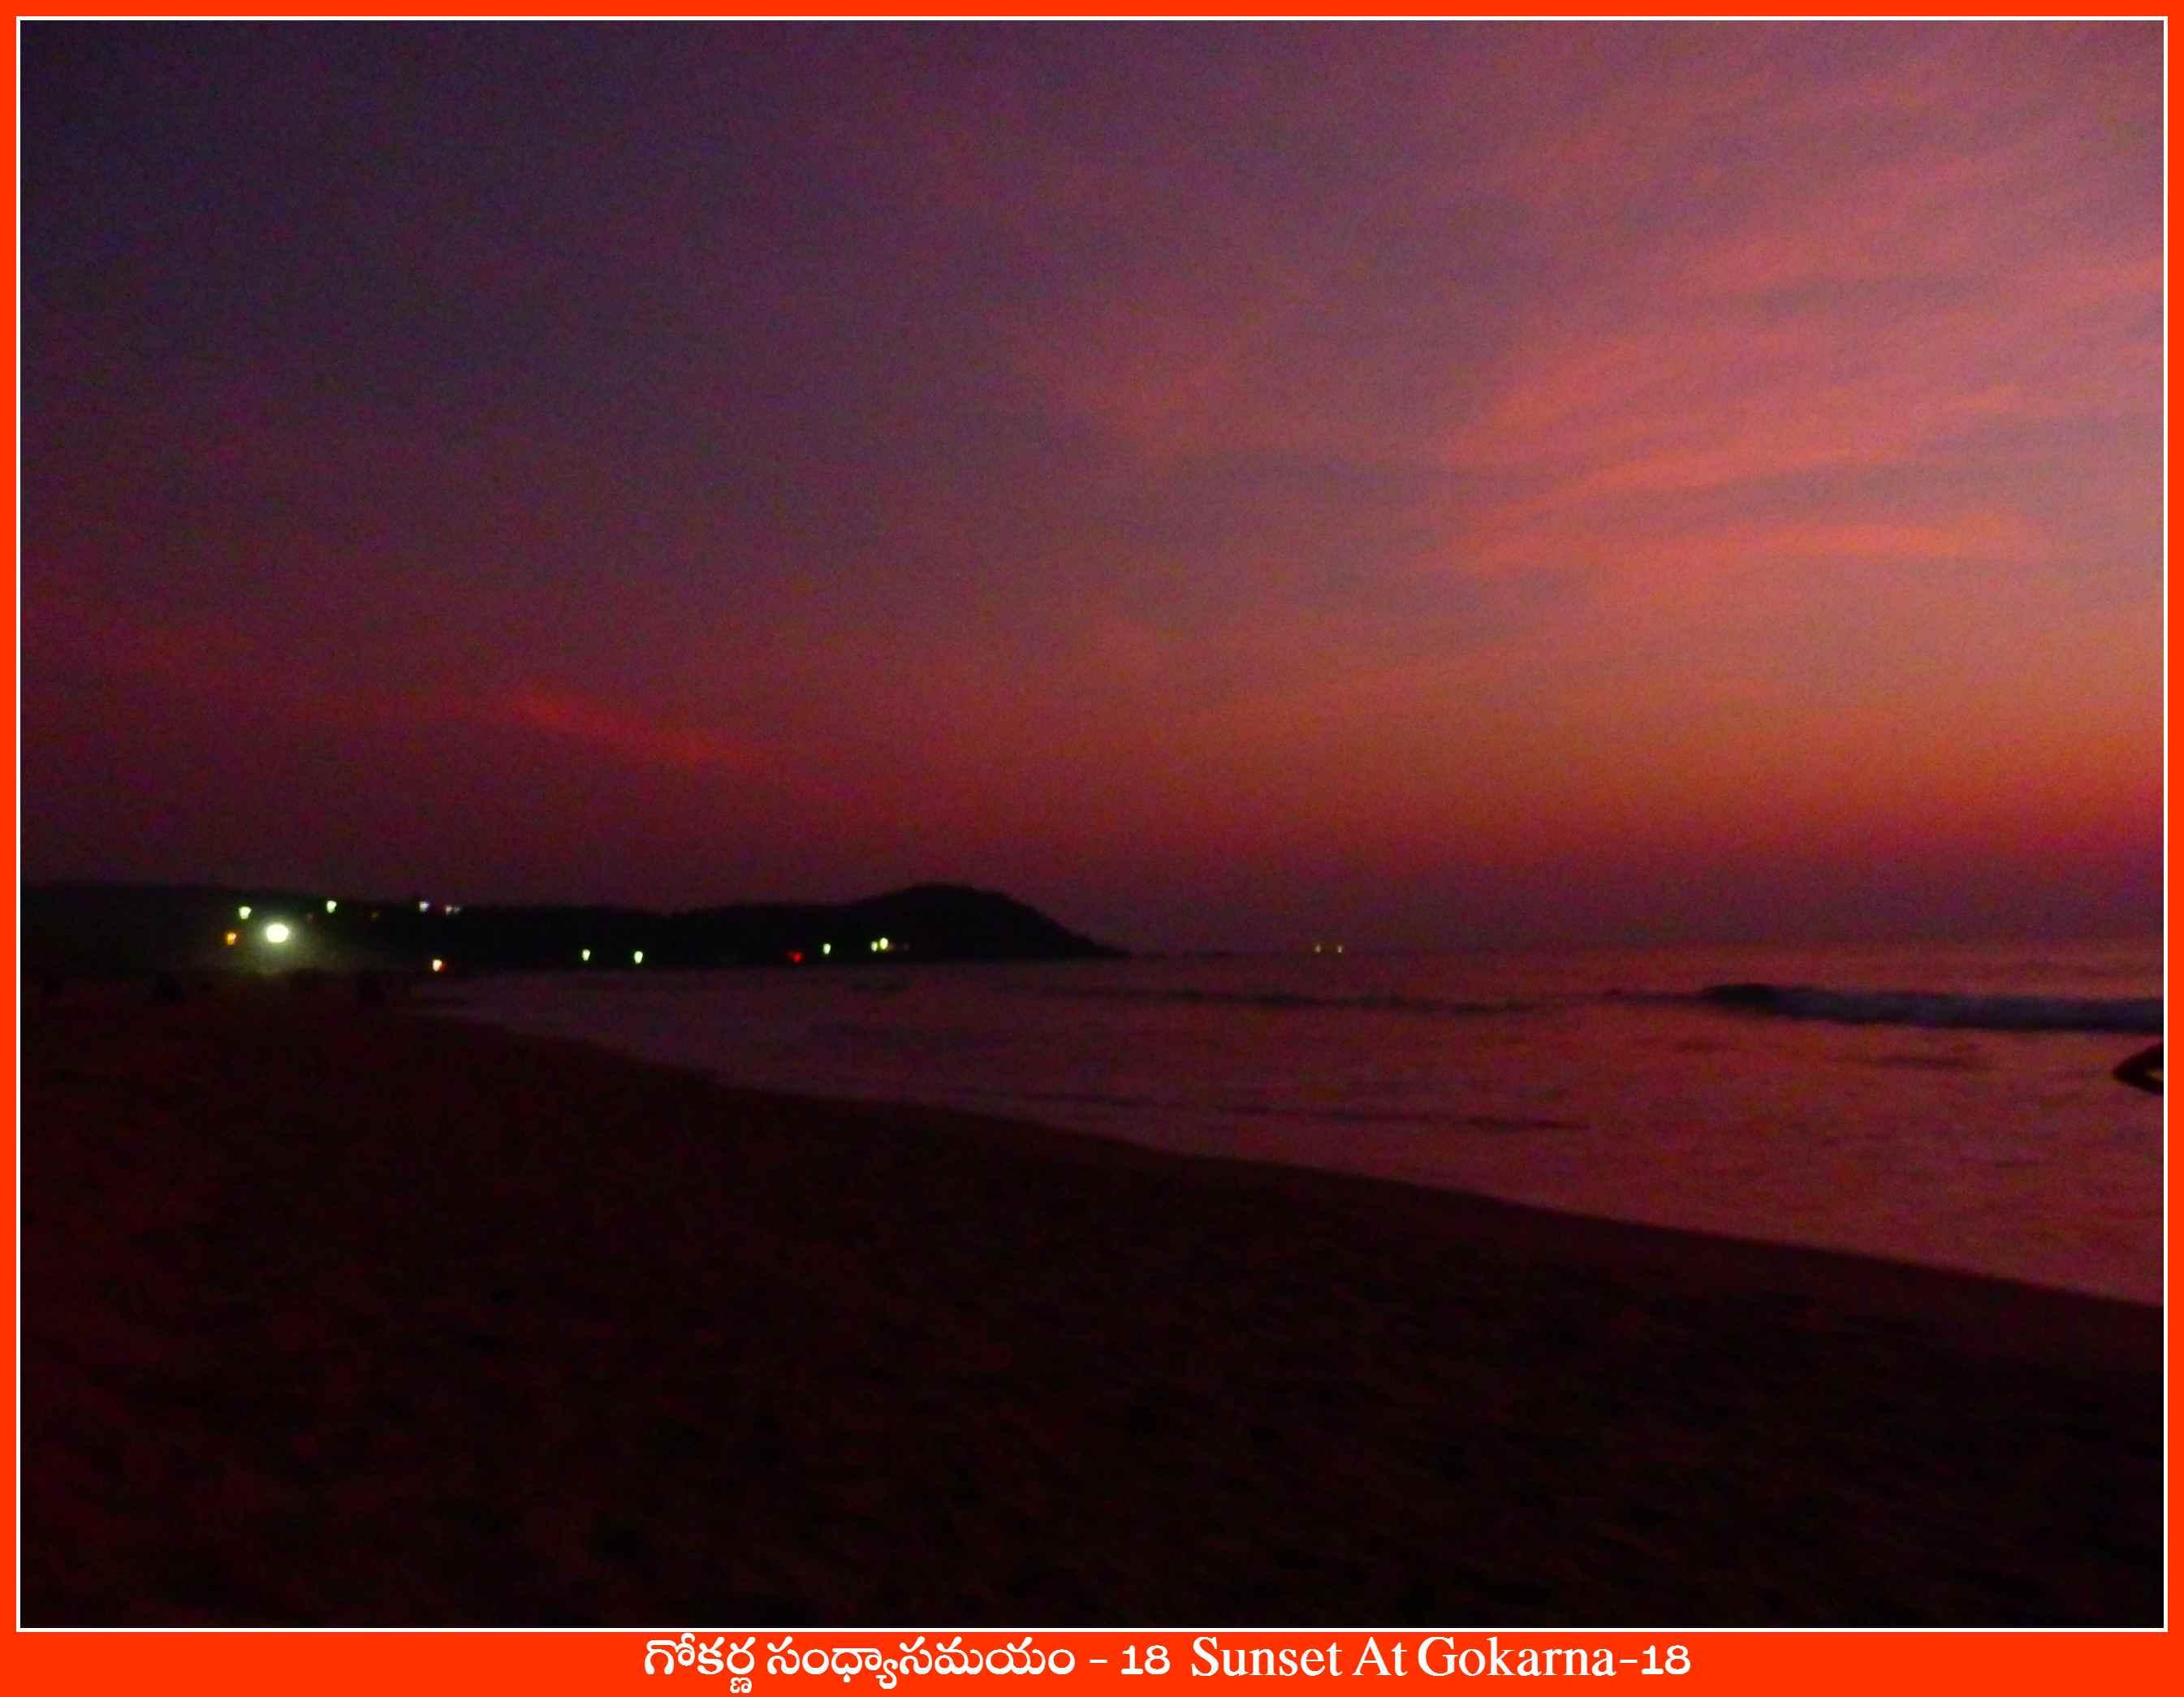 Sunset At Gokarna-18